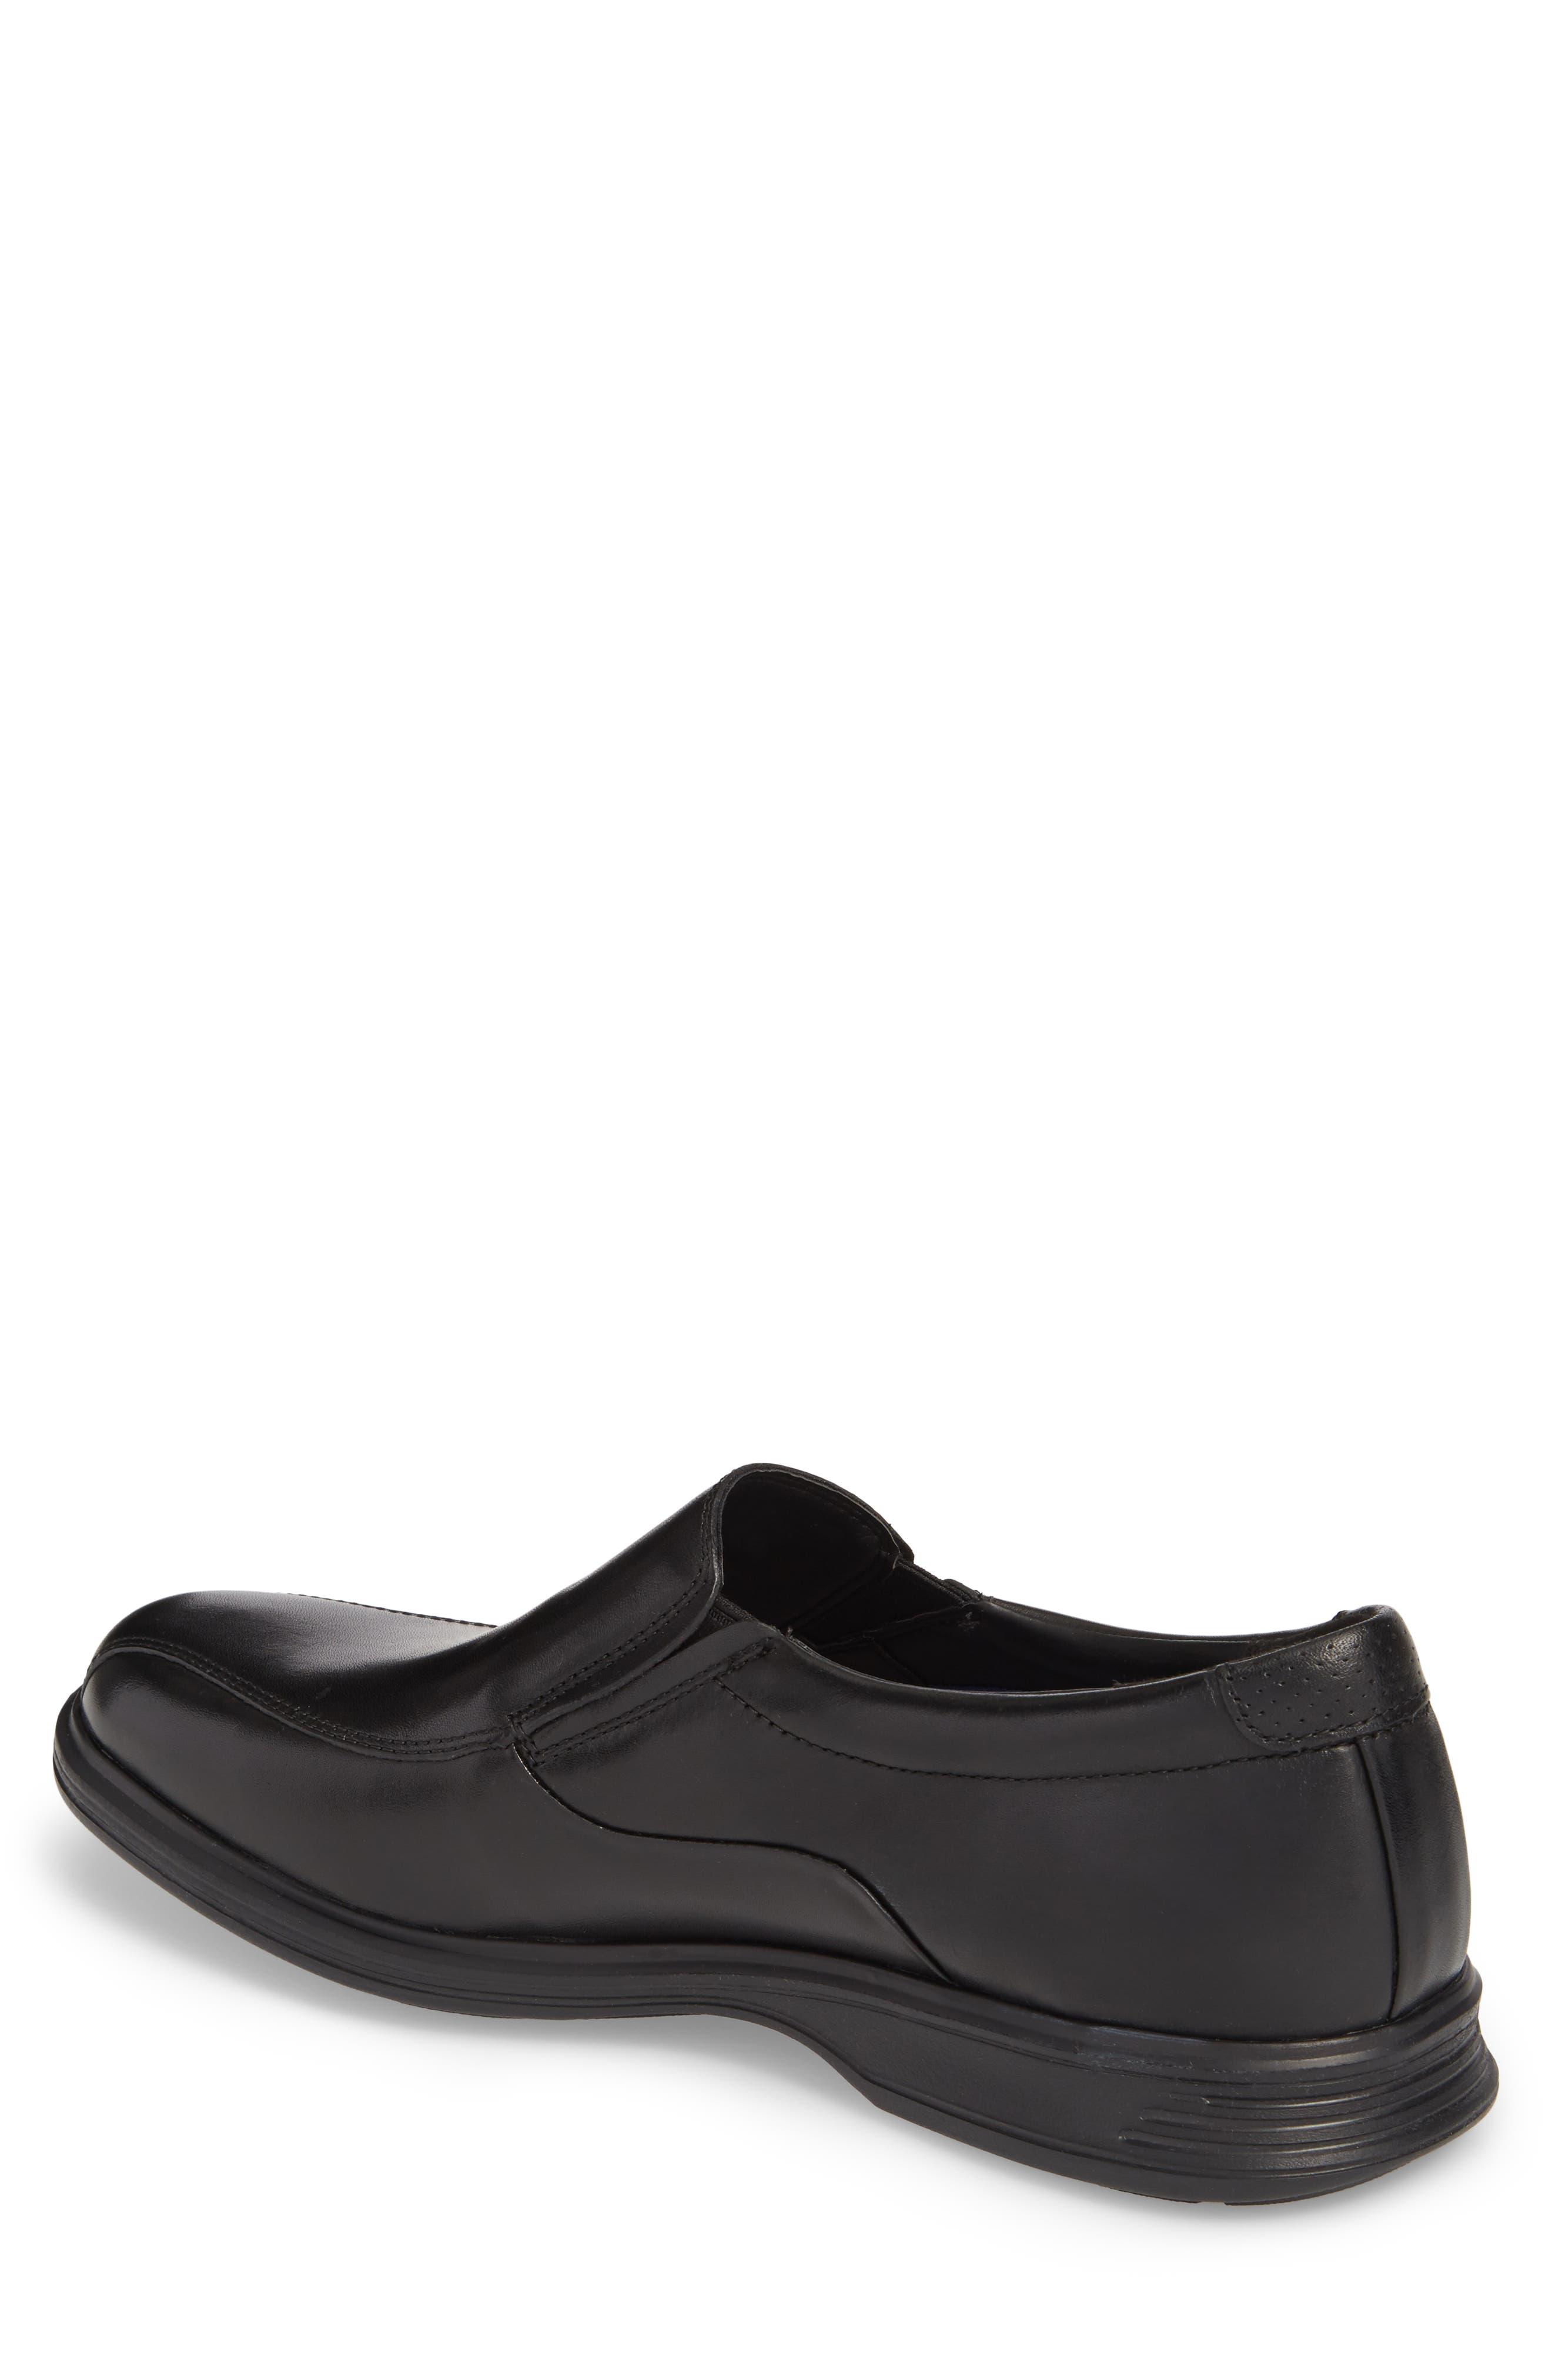 Dressports 2 Lite Venetian Loafer,                             Alternate thumbnail 2, color,                             Black Leather